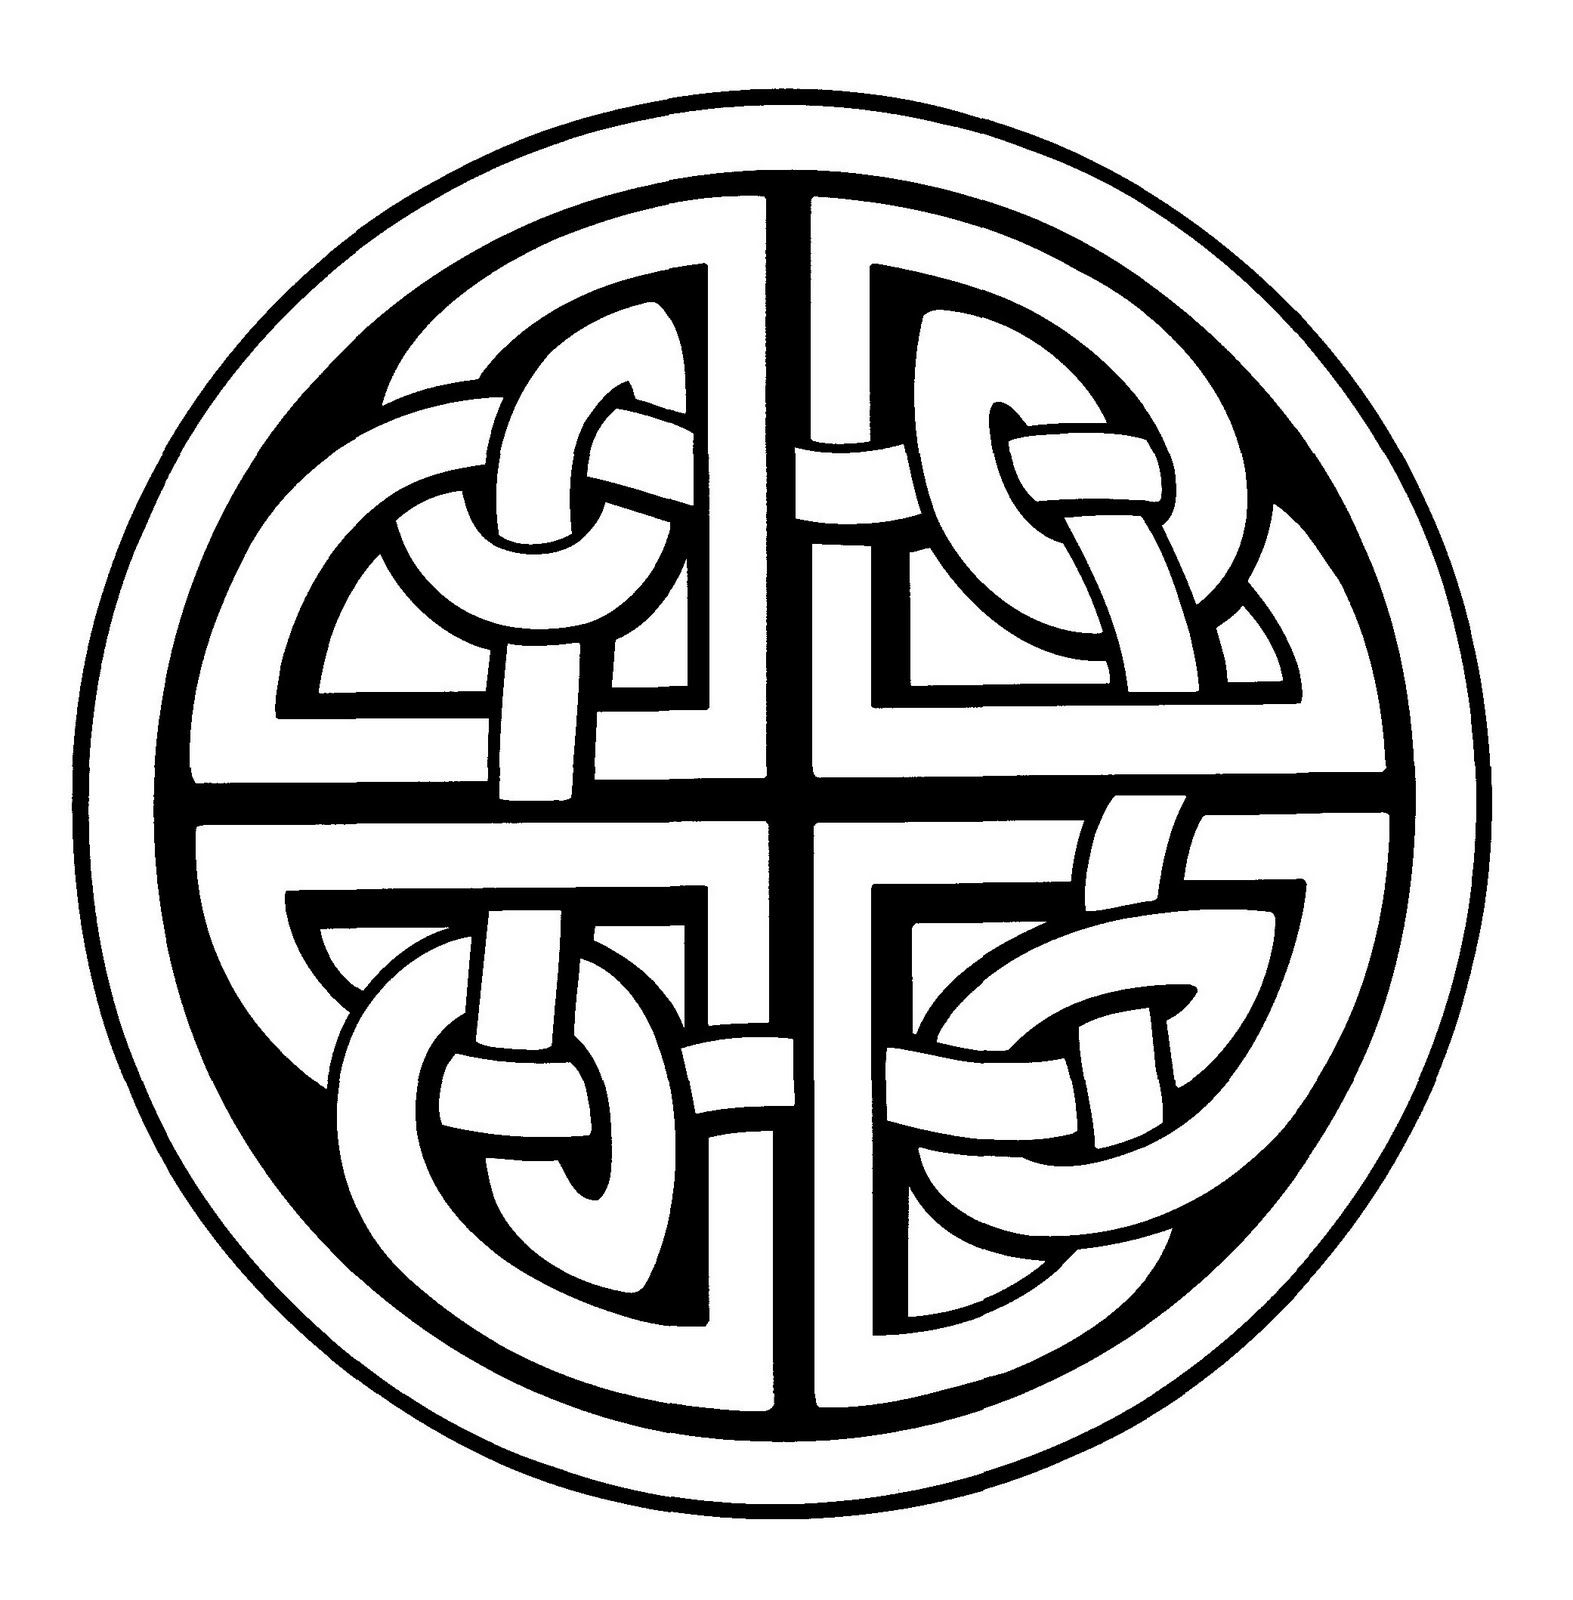 Celta redondo | simbologia | Pinterest | Celta, Tatuajes y Símbolos